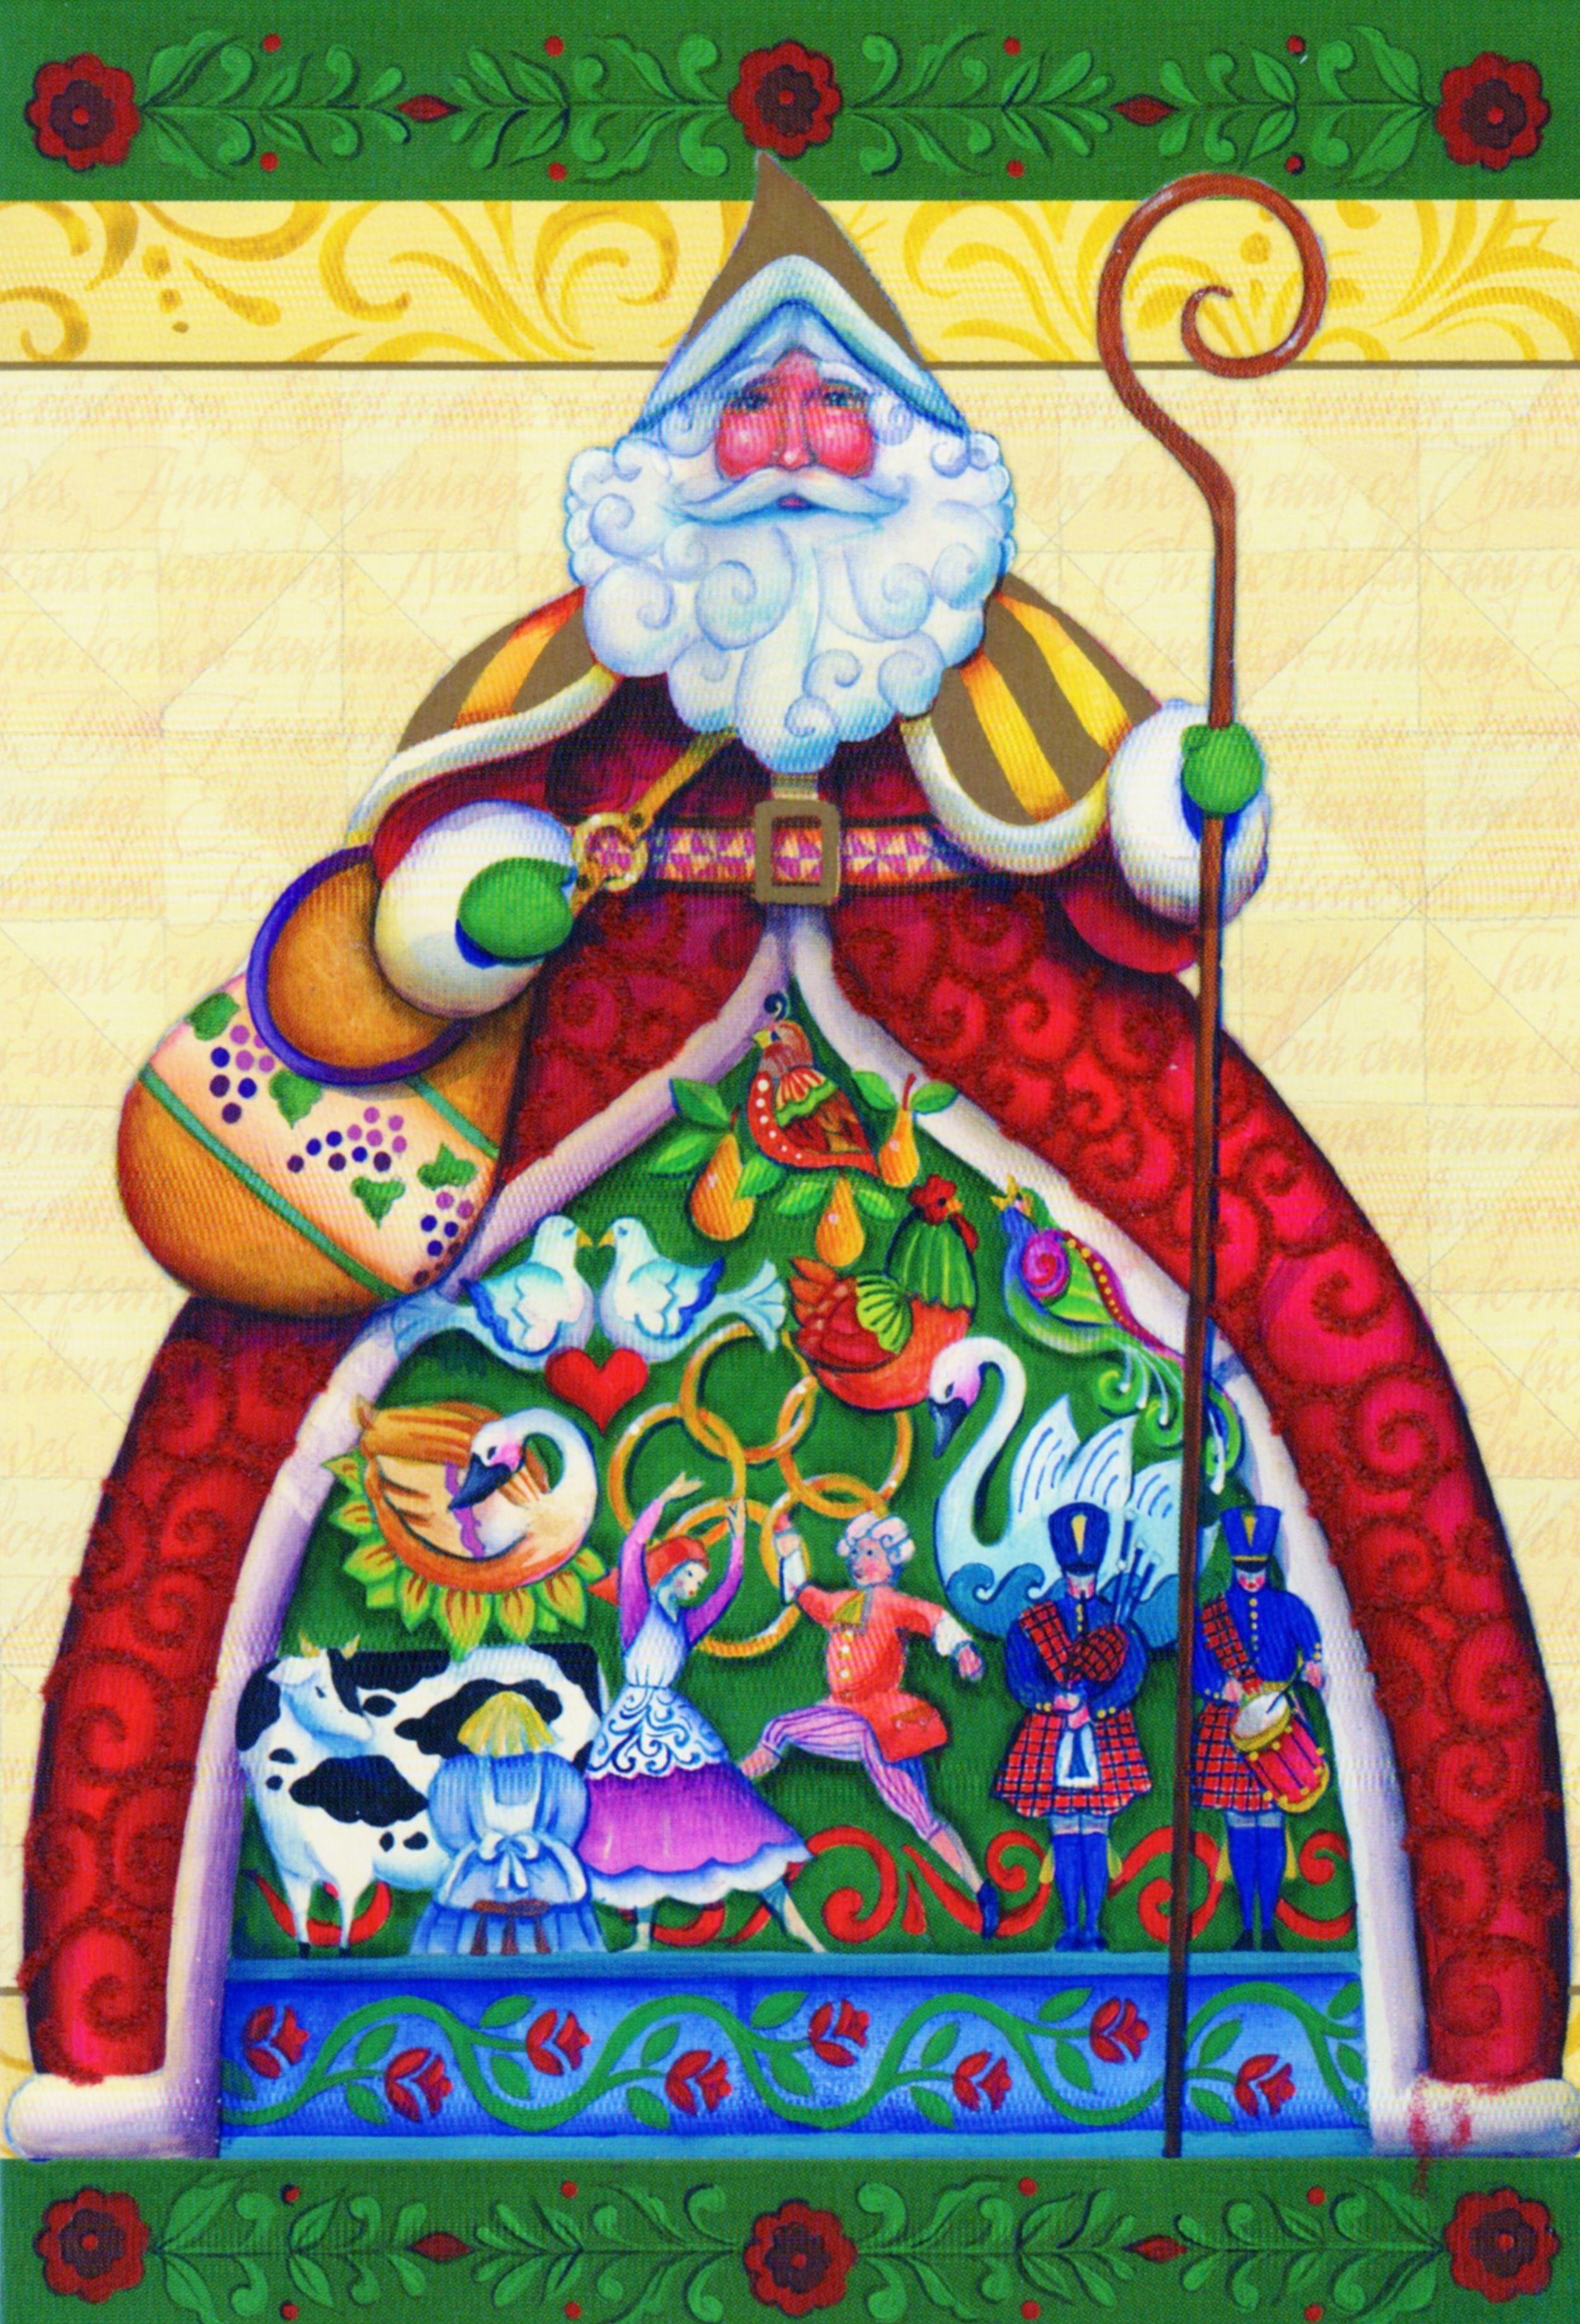 Jim Shore Christmas Card, 12 Days of Christmas   Jim shore ...